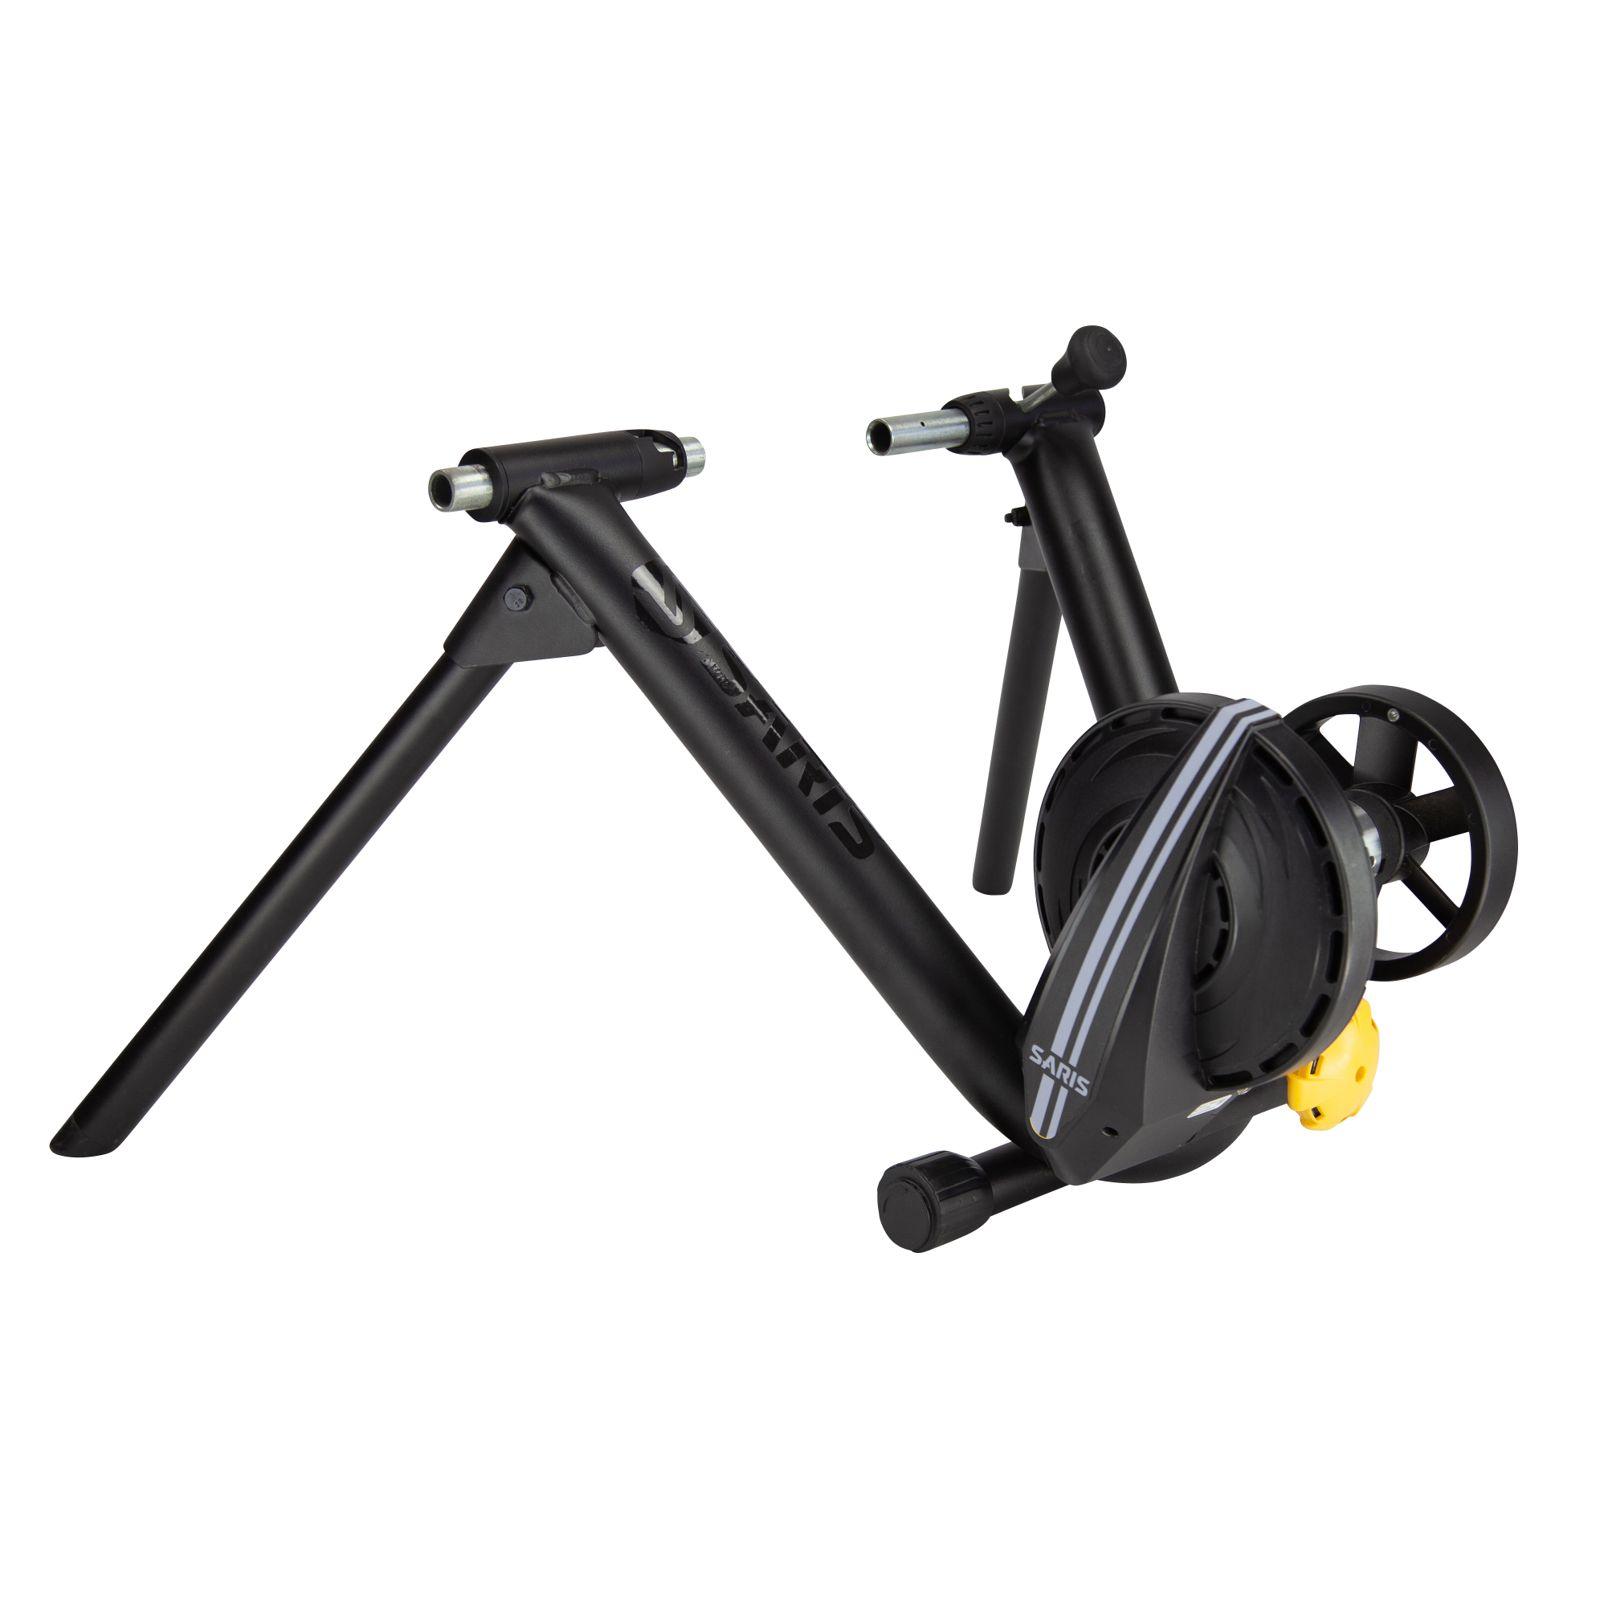 ROLO DE TREINO CYCLEOPS M2 SMART INTERATIVO